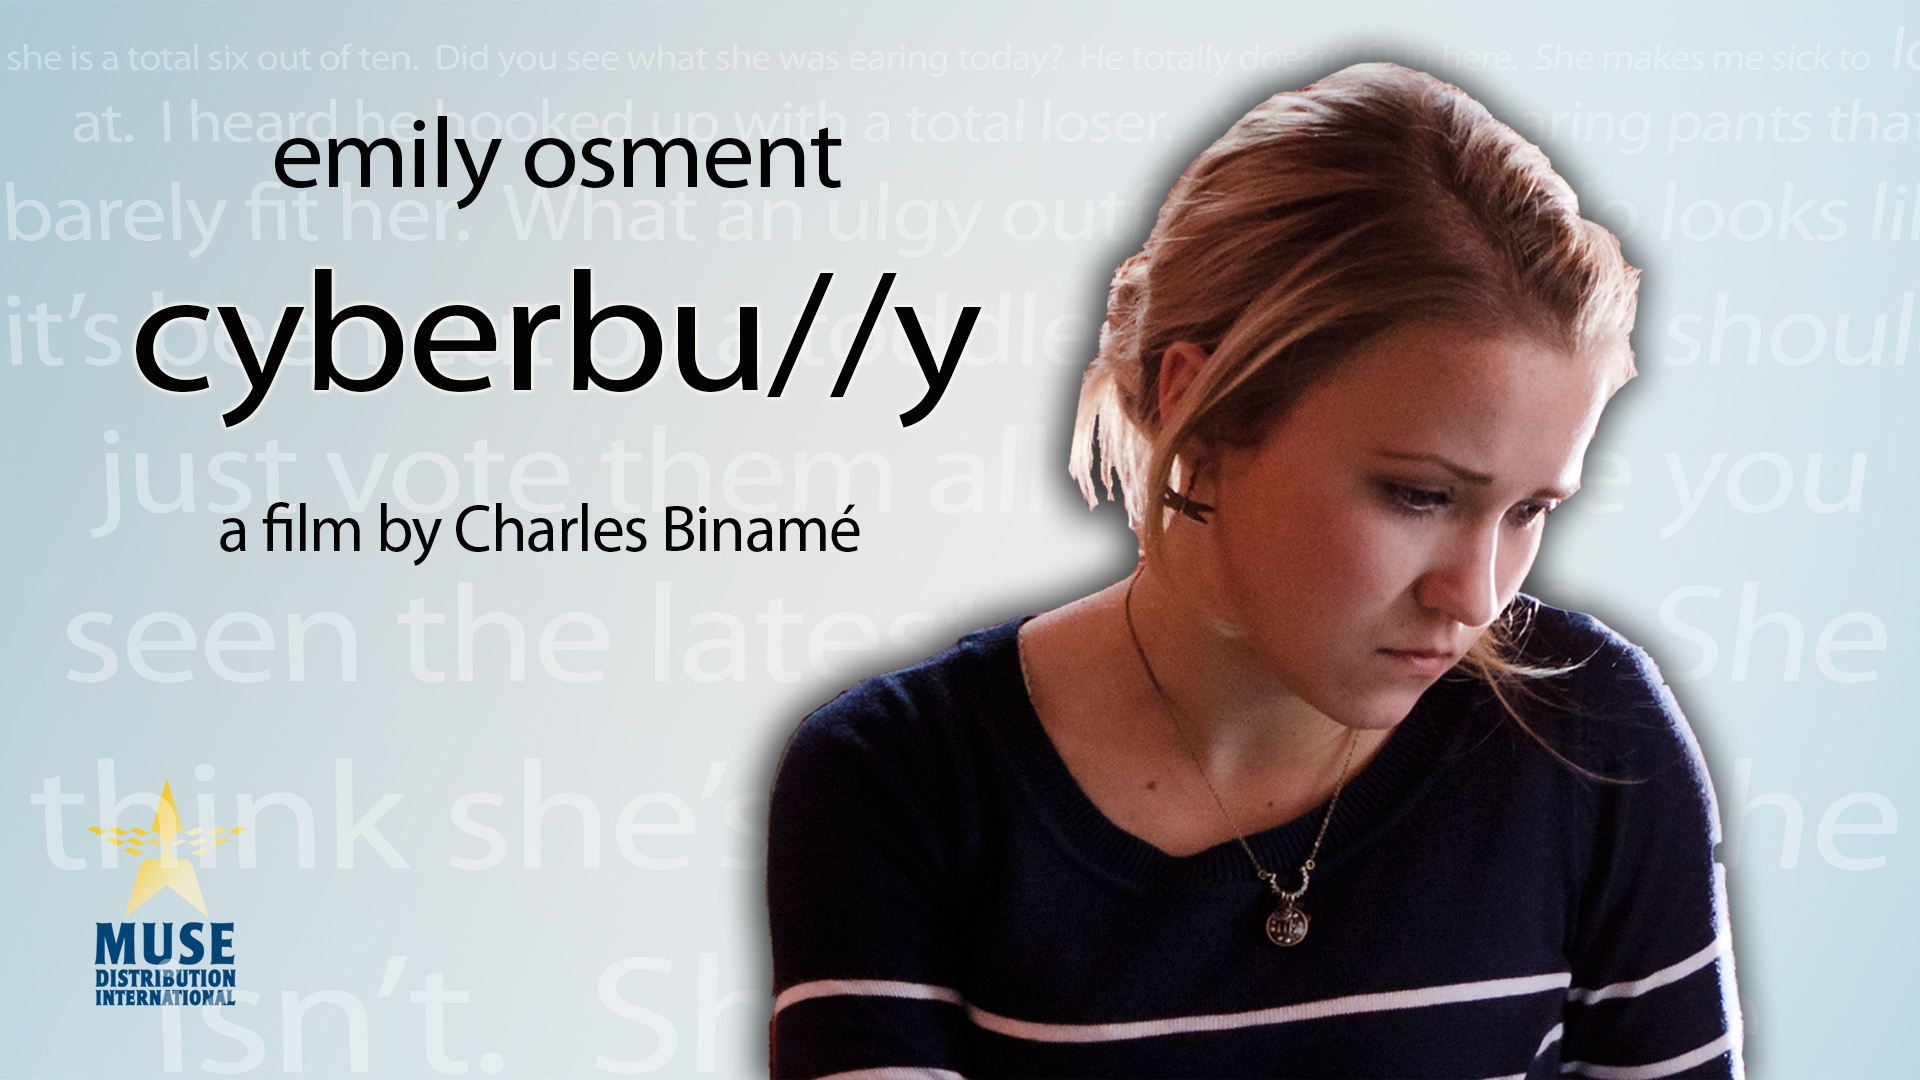 Cyber Bully